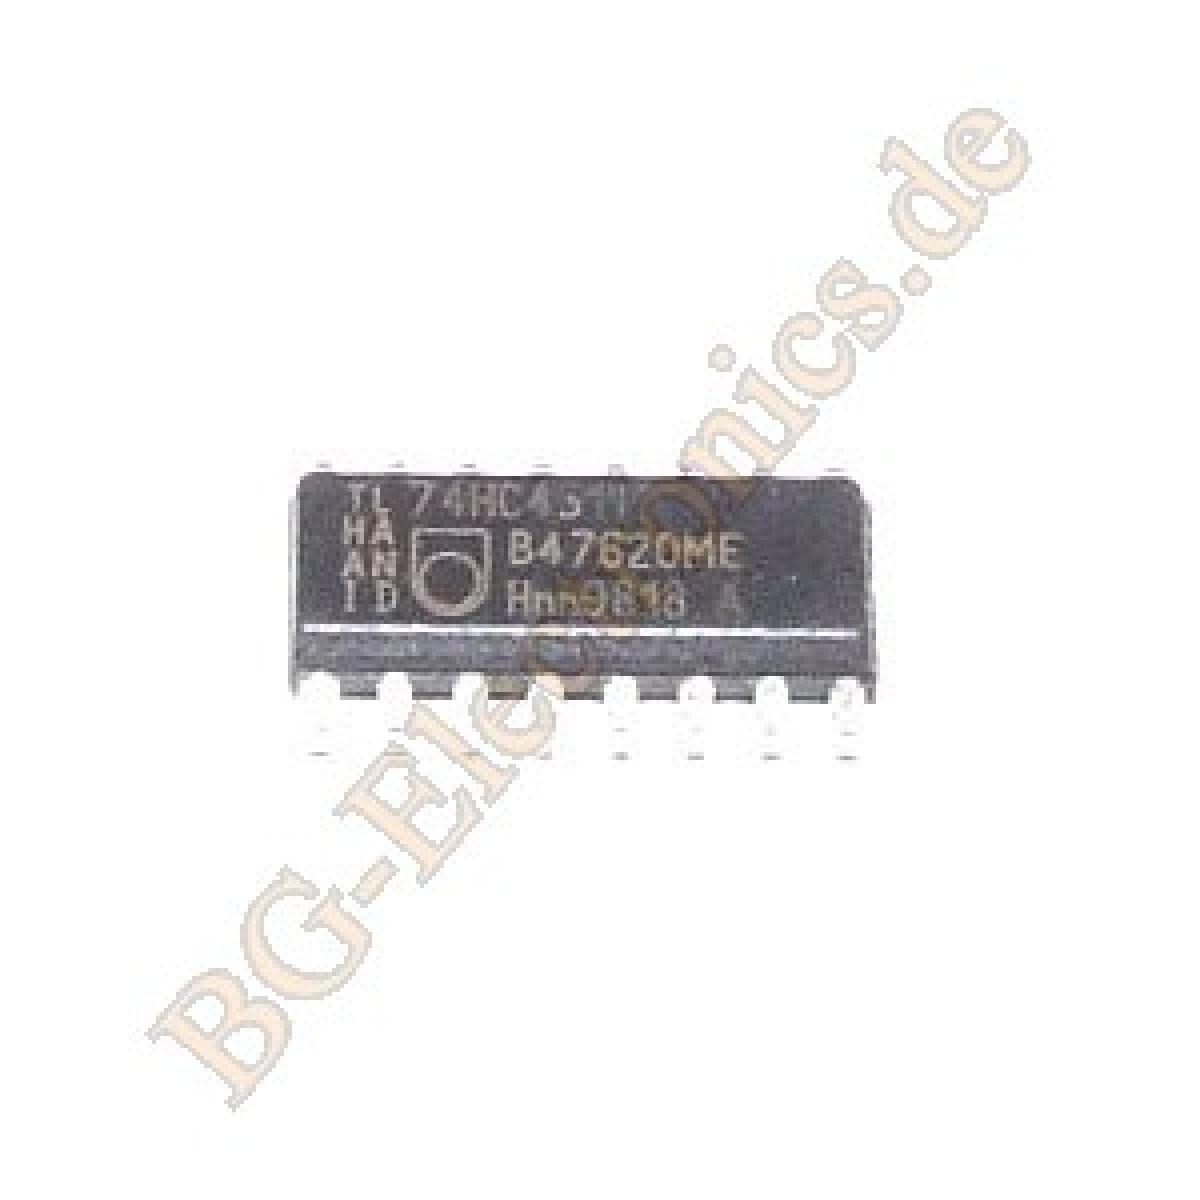 2-x-74HC4511D-BCD-to-Seven-Segment-Latch-Decoder-Display-D-Philips-SO-16-2pcs